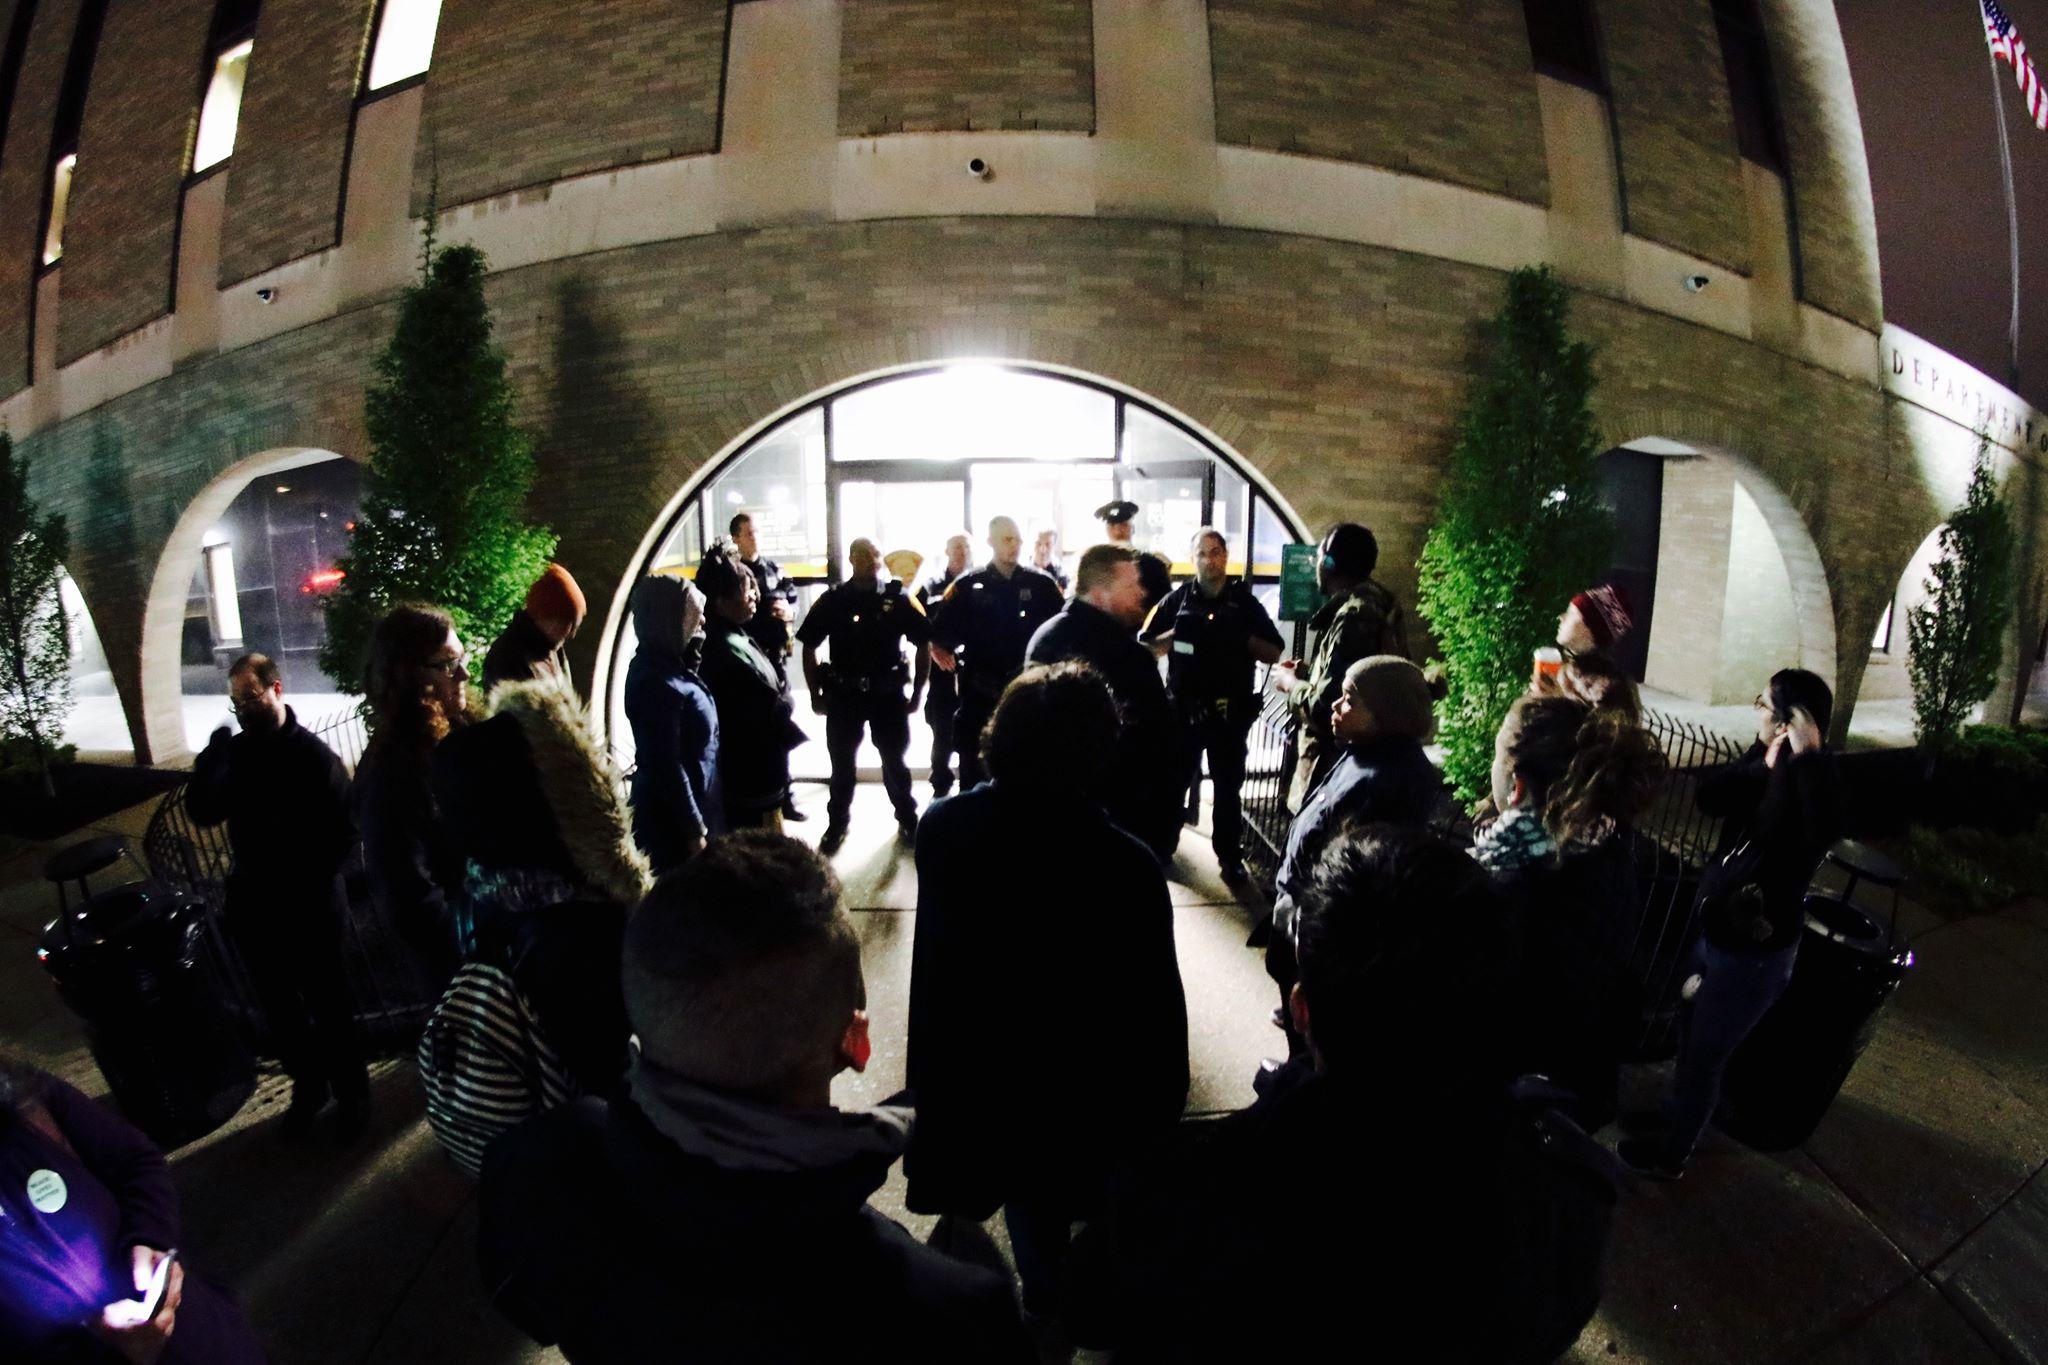 Bridgeport police raid #JusticeForJayson memorial, community demands justice